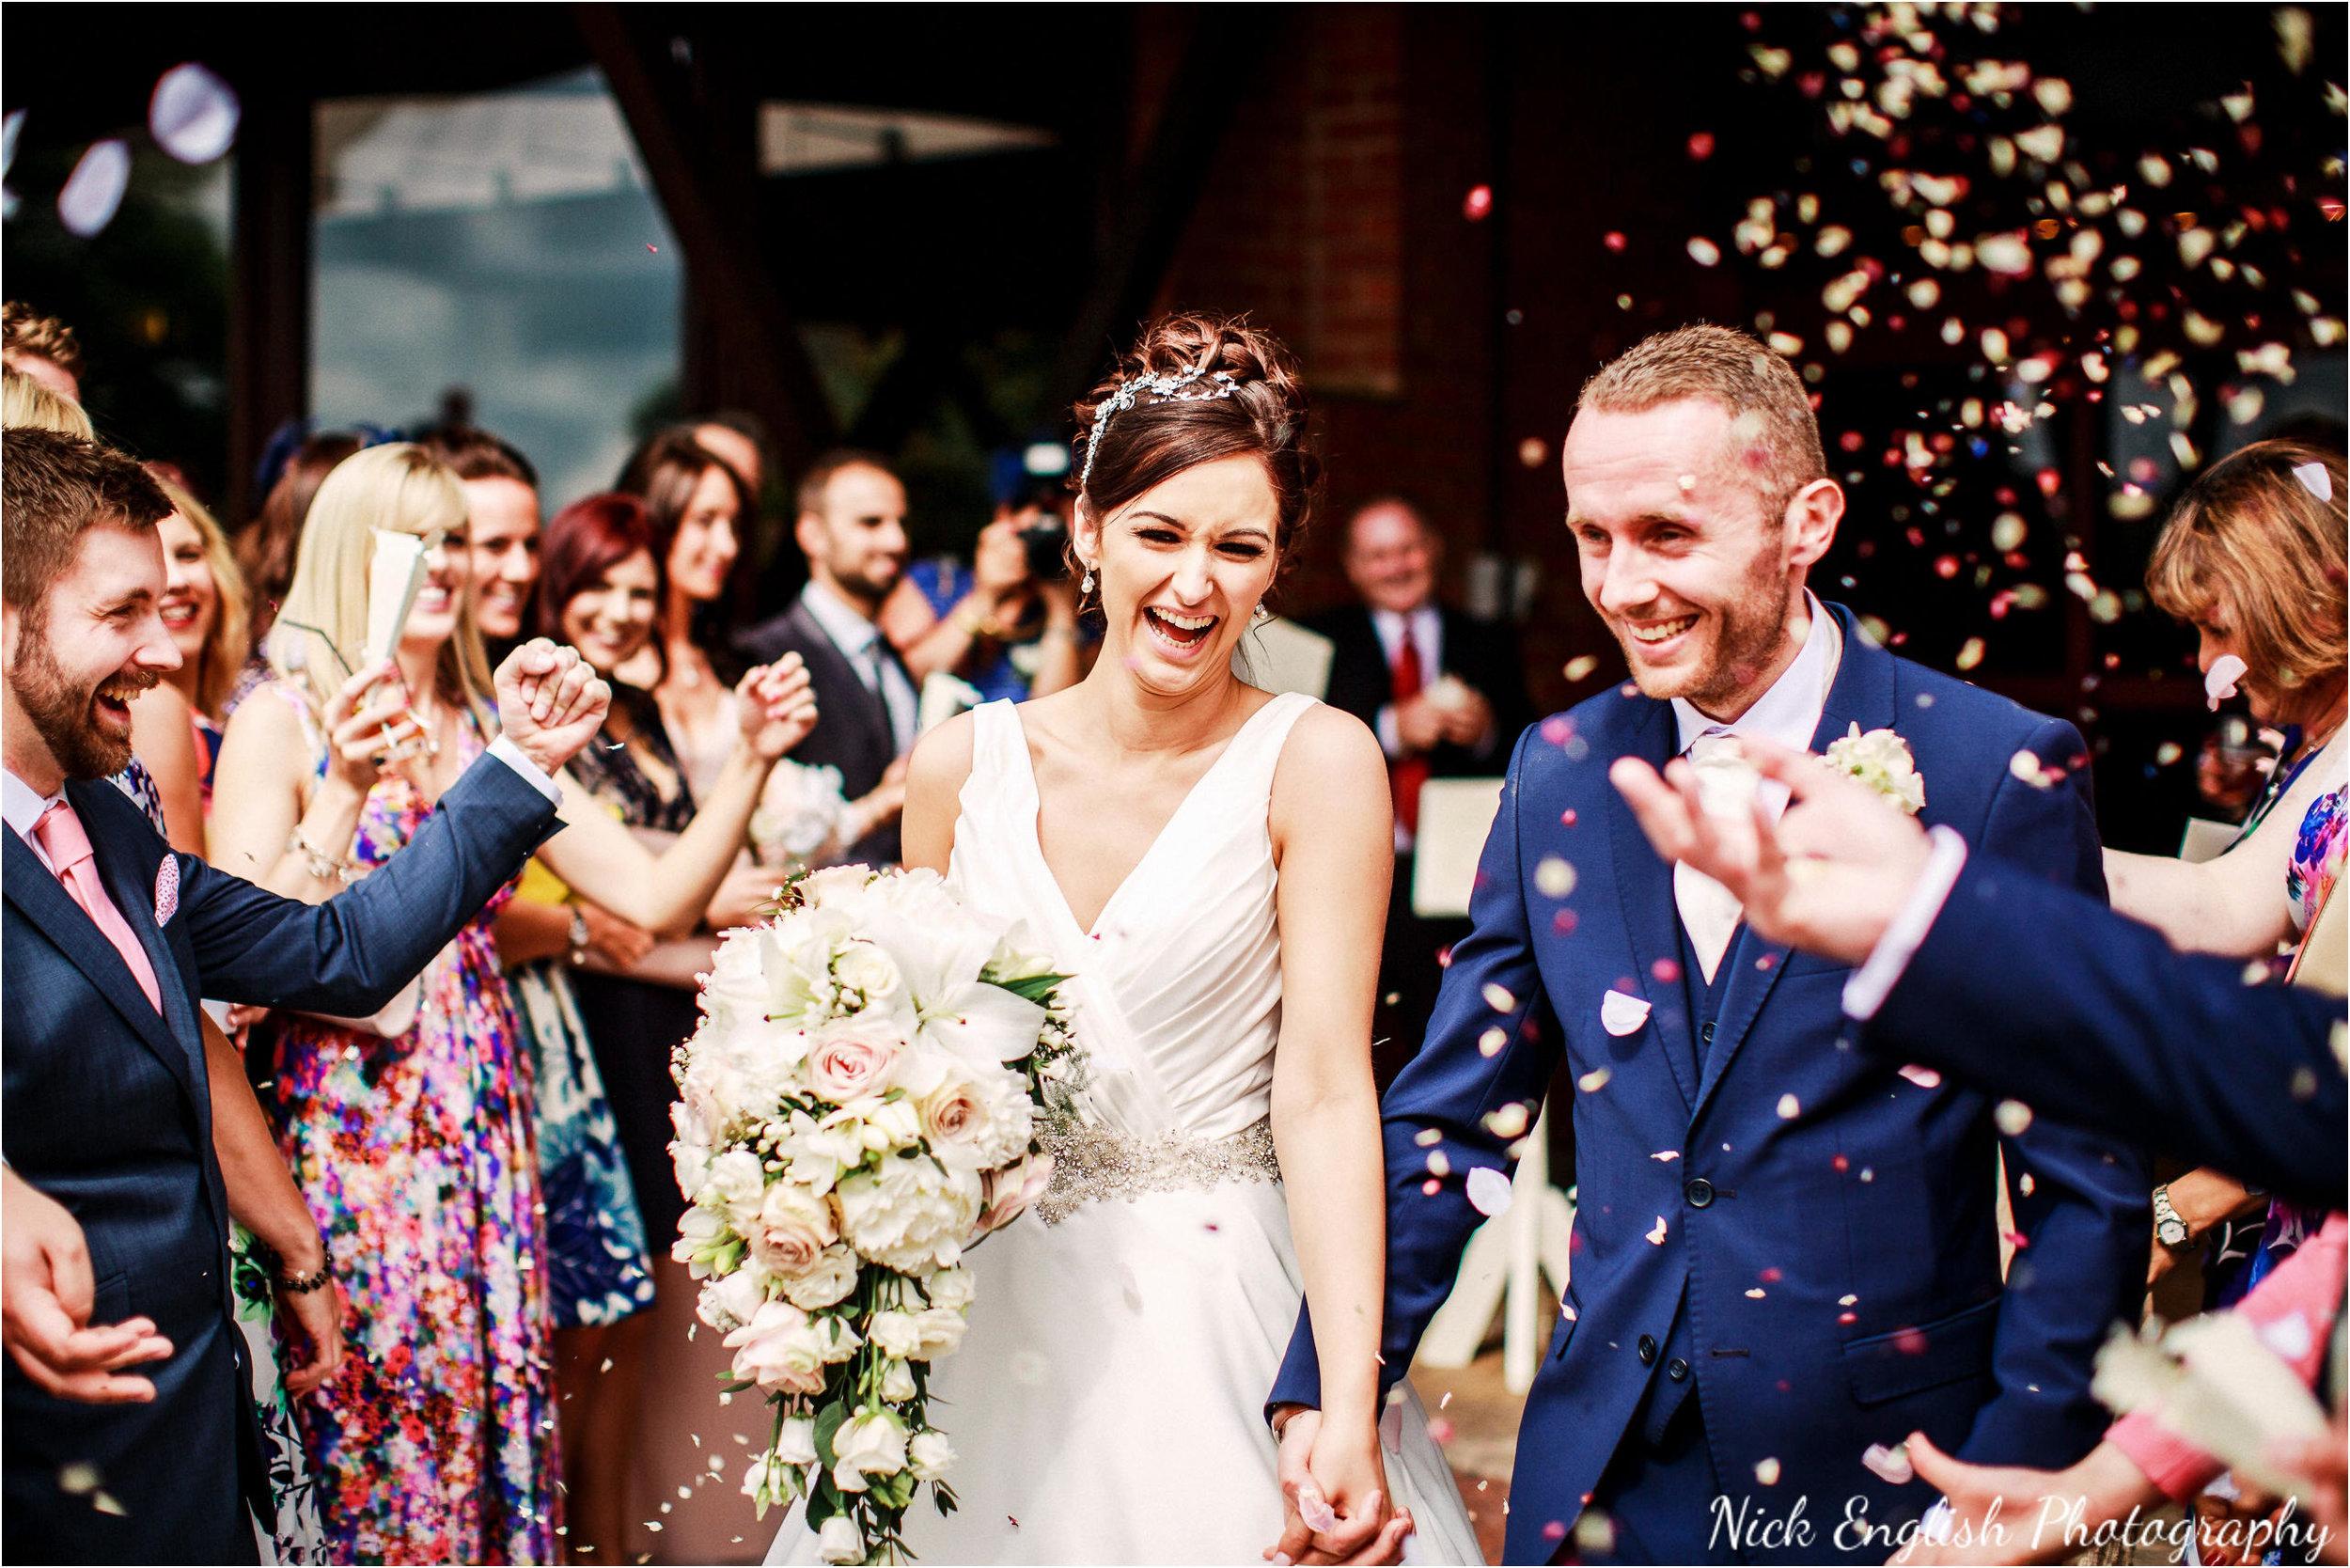 Emily David Wedding Photographs at Barton Grange Preston by Nick English Photography 153jpg.jpeg